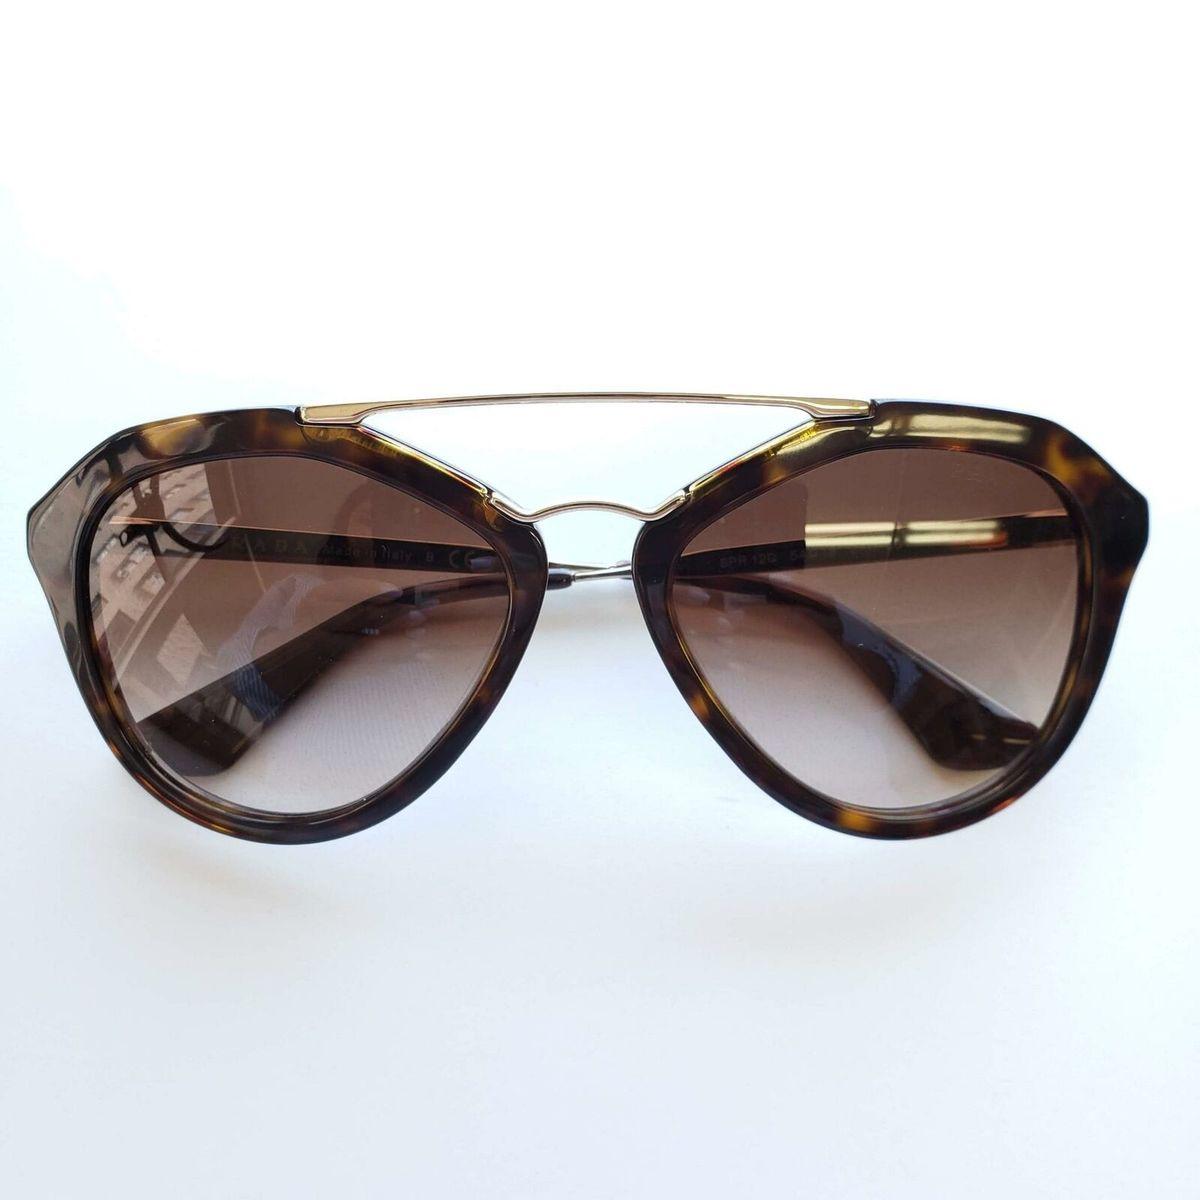 Prada プラダ レディース トートイズフレーム サングラス ブラウンSPR 12Q 2AU-6S1 Women's Havana Frame Sunglasses | Brown